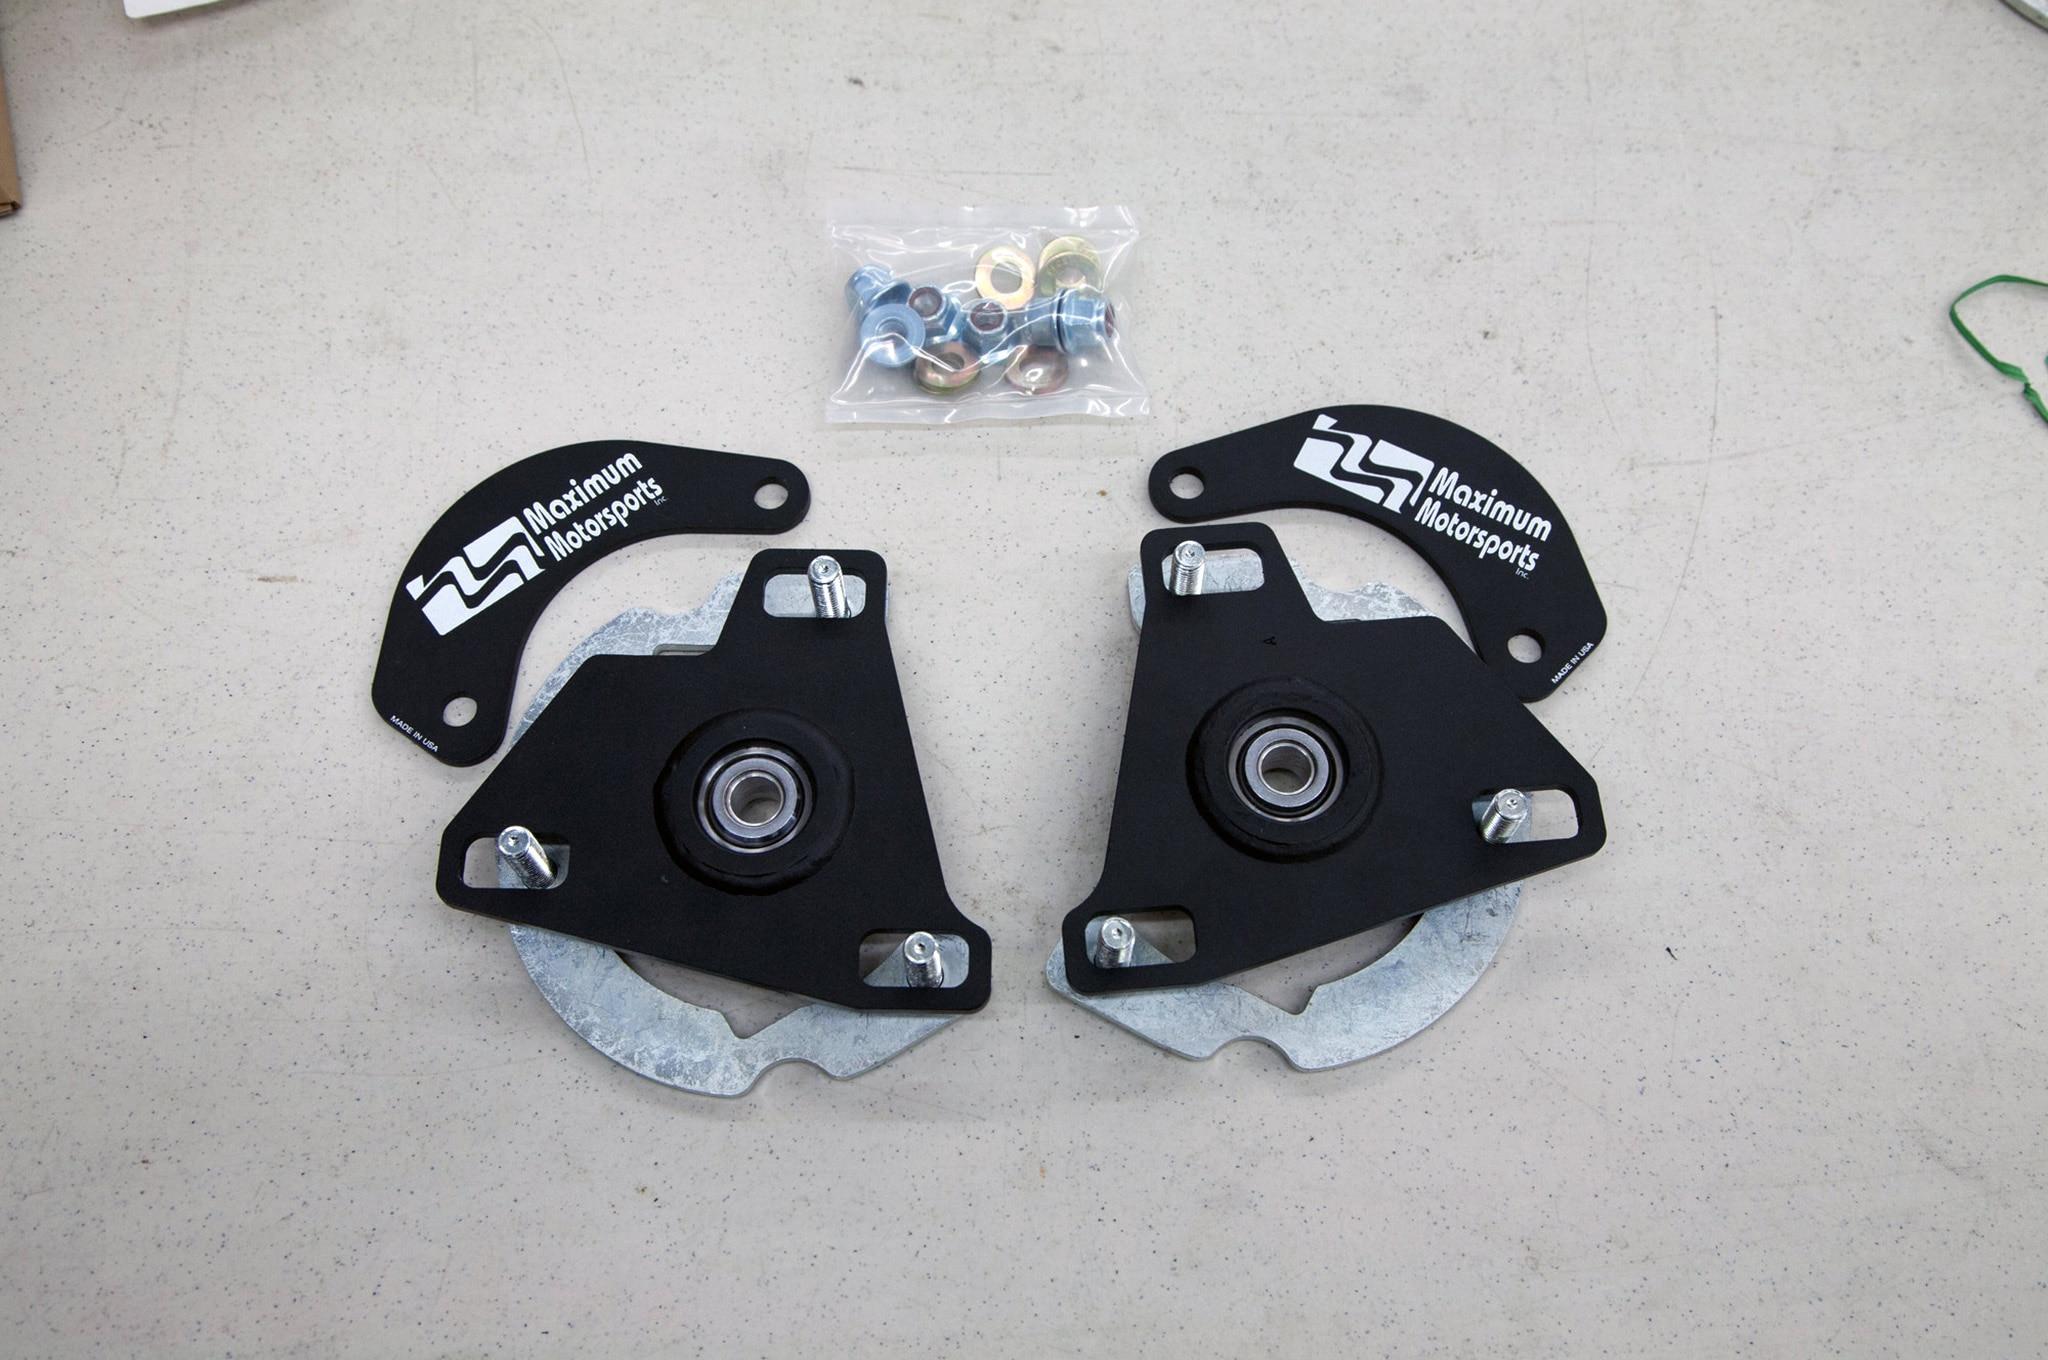 Maximum Motorsports S550 Camber Caster Install 02 Plates